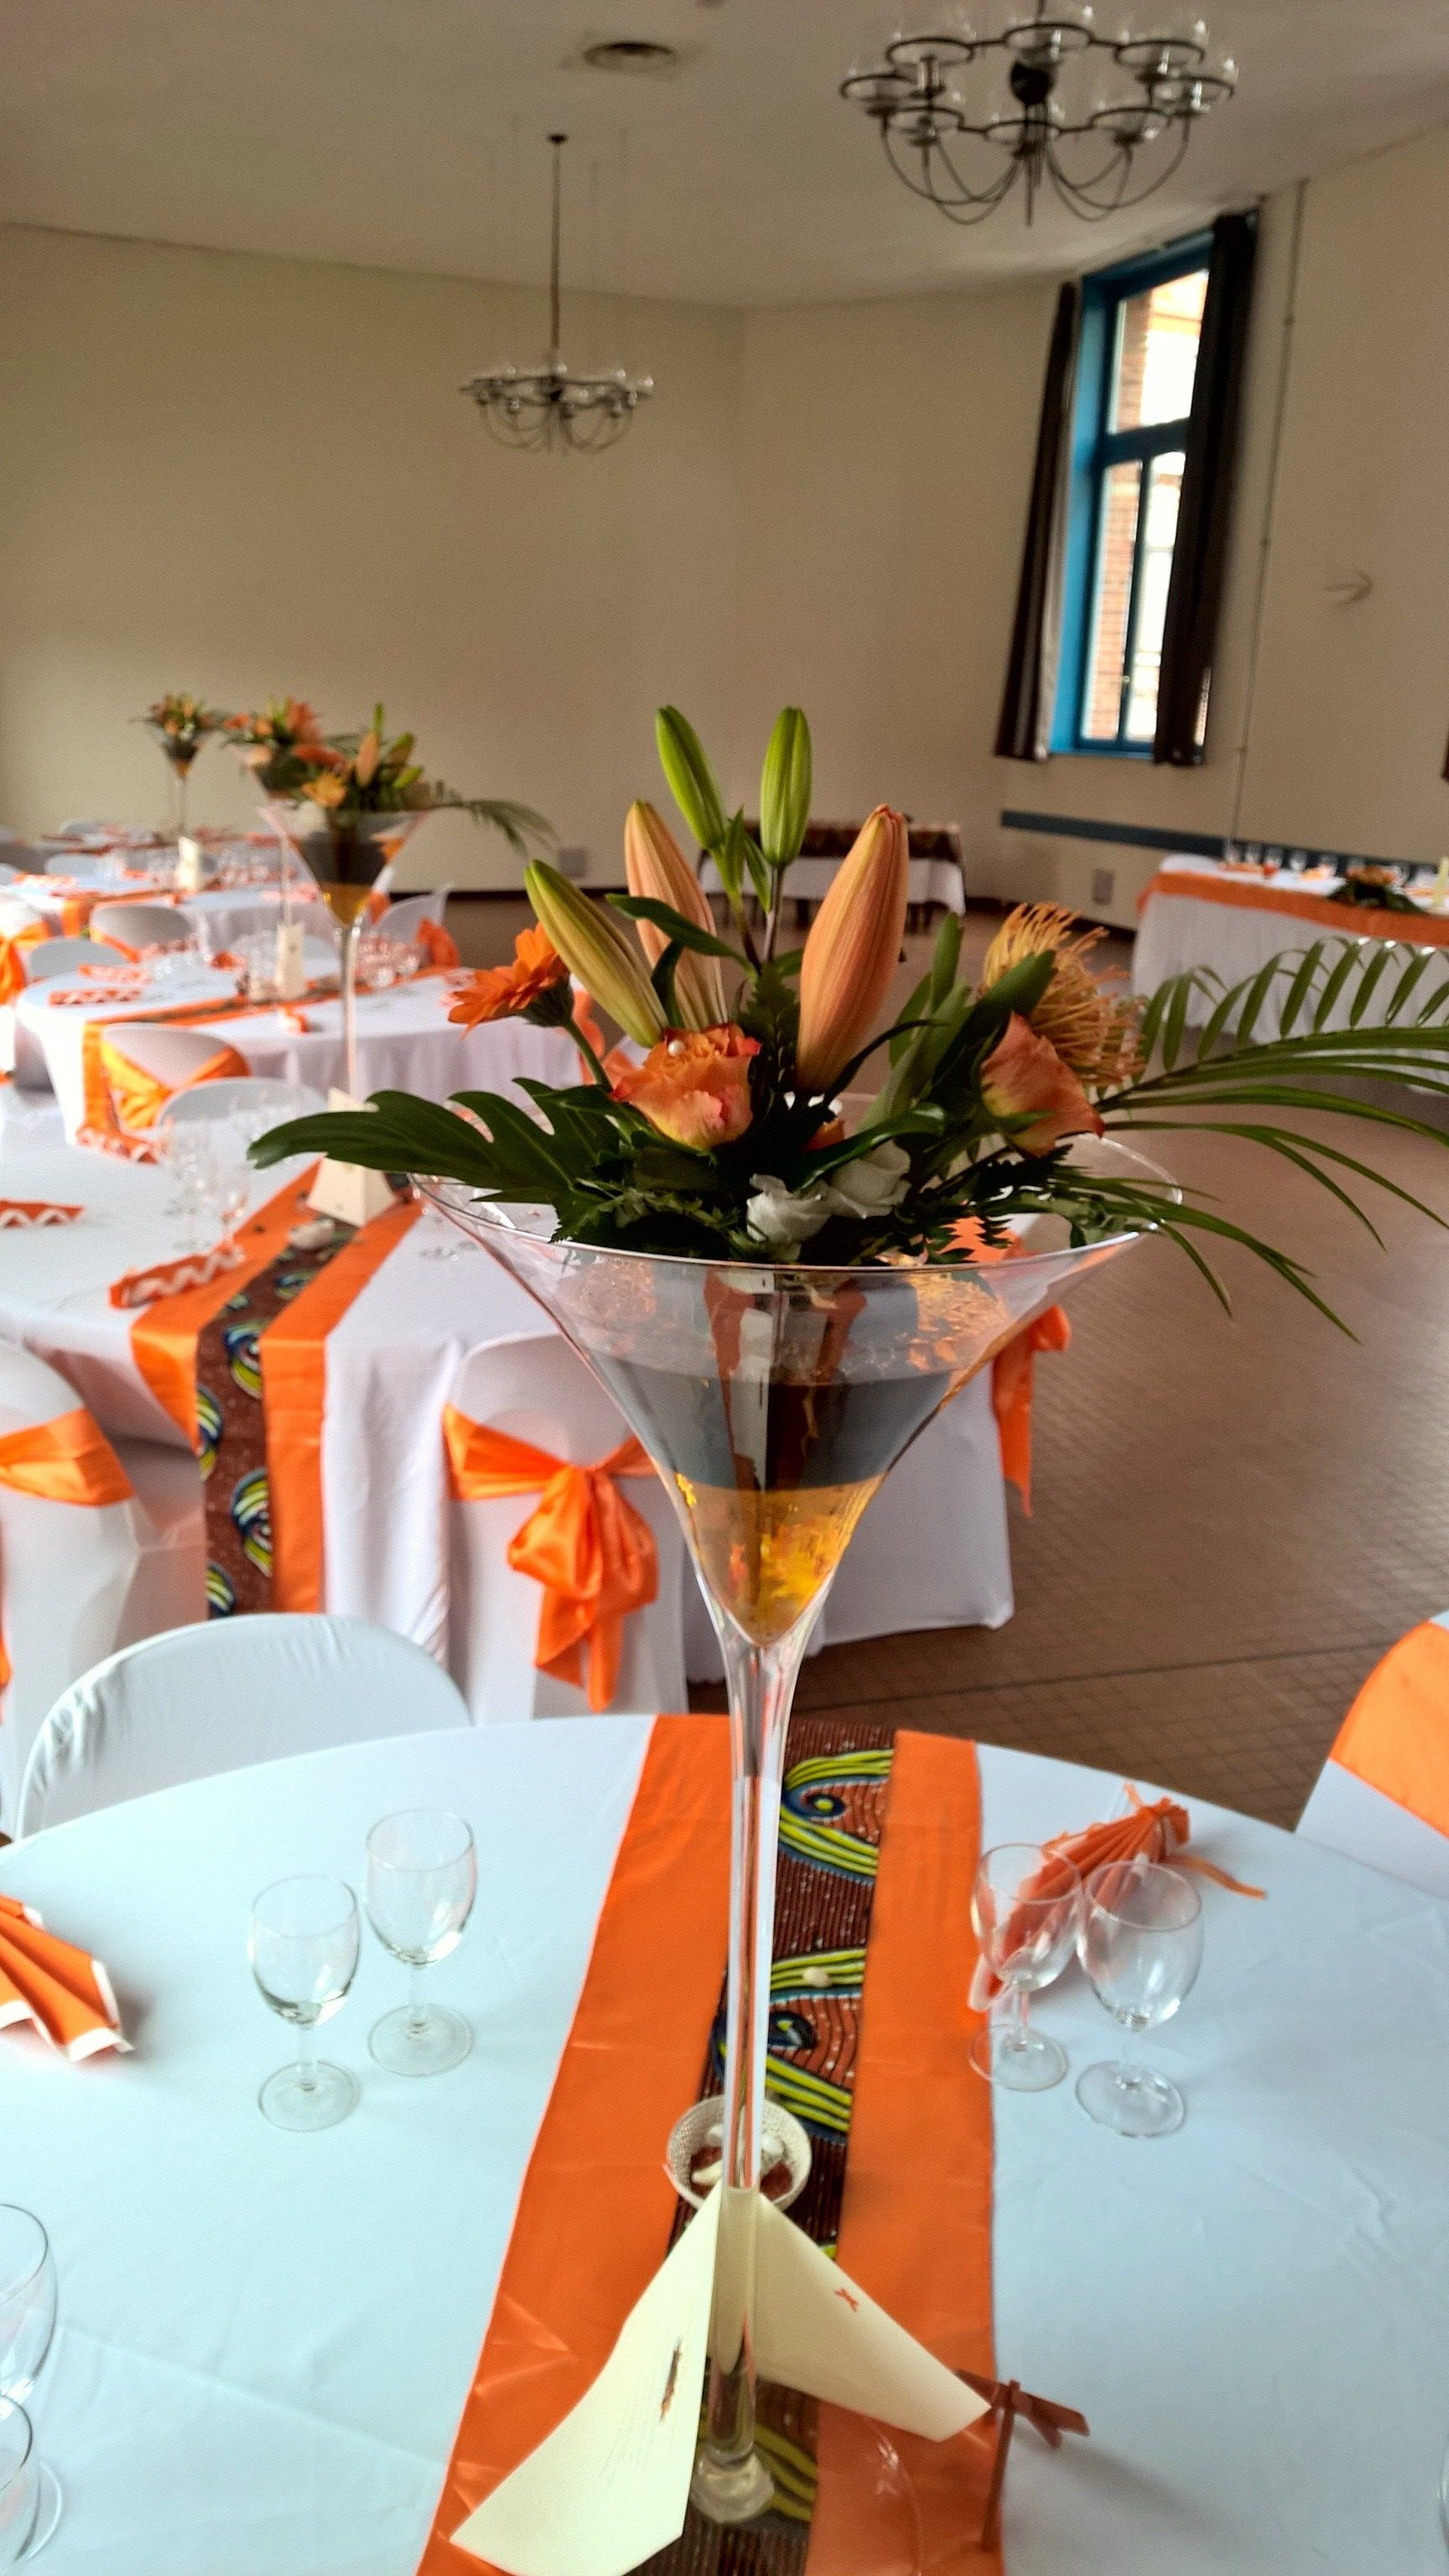 Nigerian traditional wedding decor ideas  Wedding tropical exotisme afro uoccidental thème  déco table